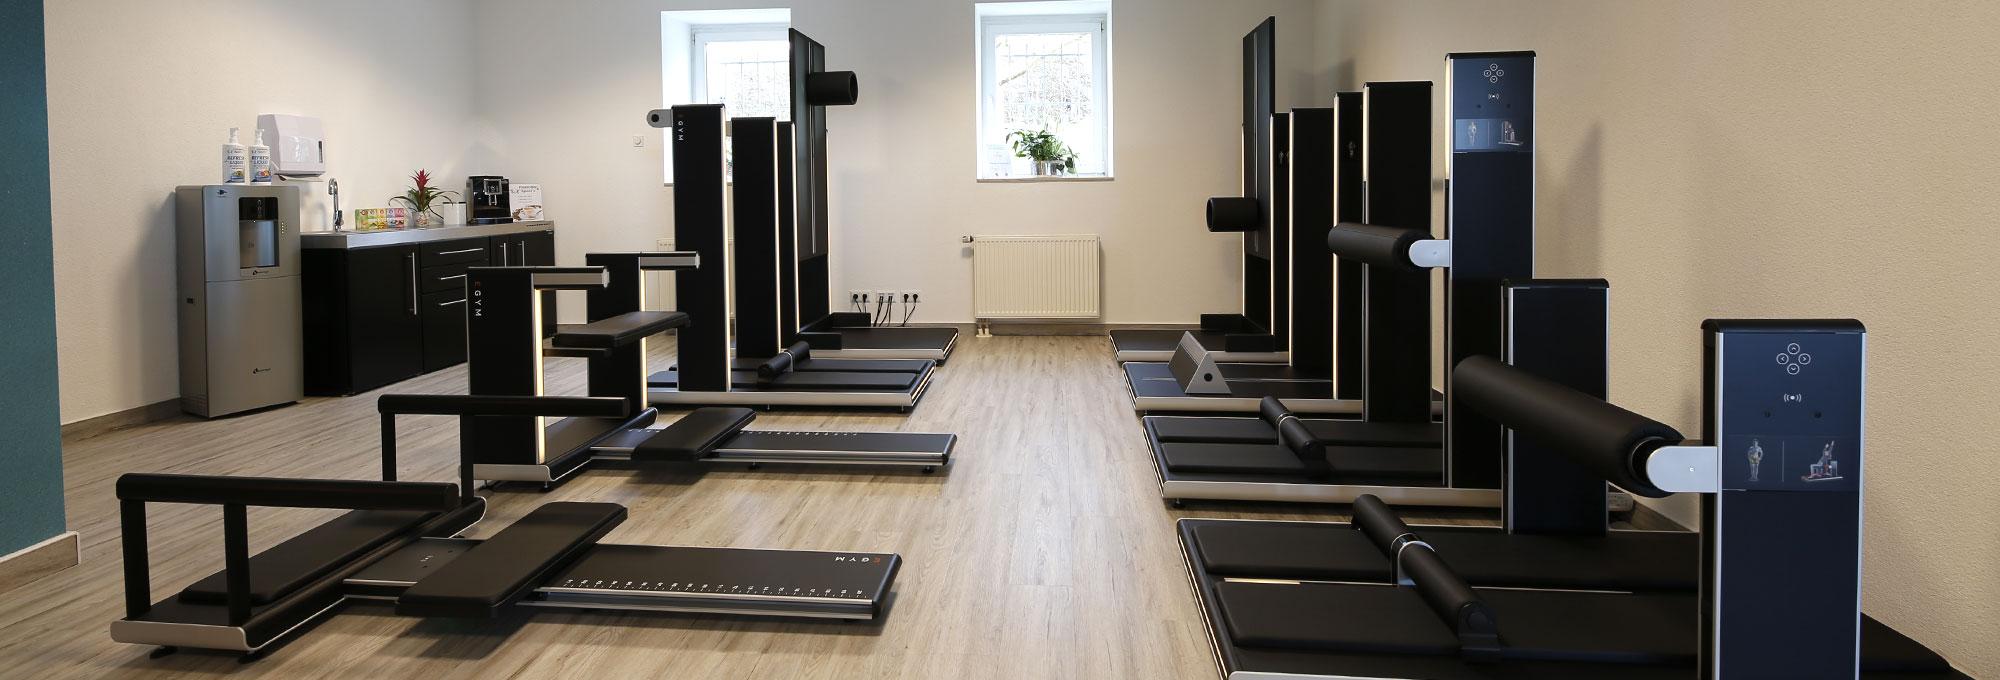 FLE-XX Training im Fitnessstudio Nossen | PASSION Sport's